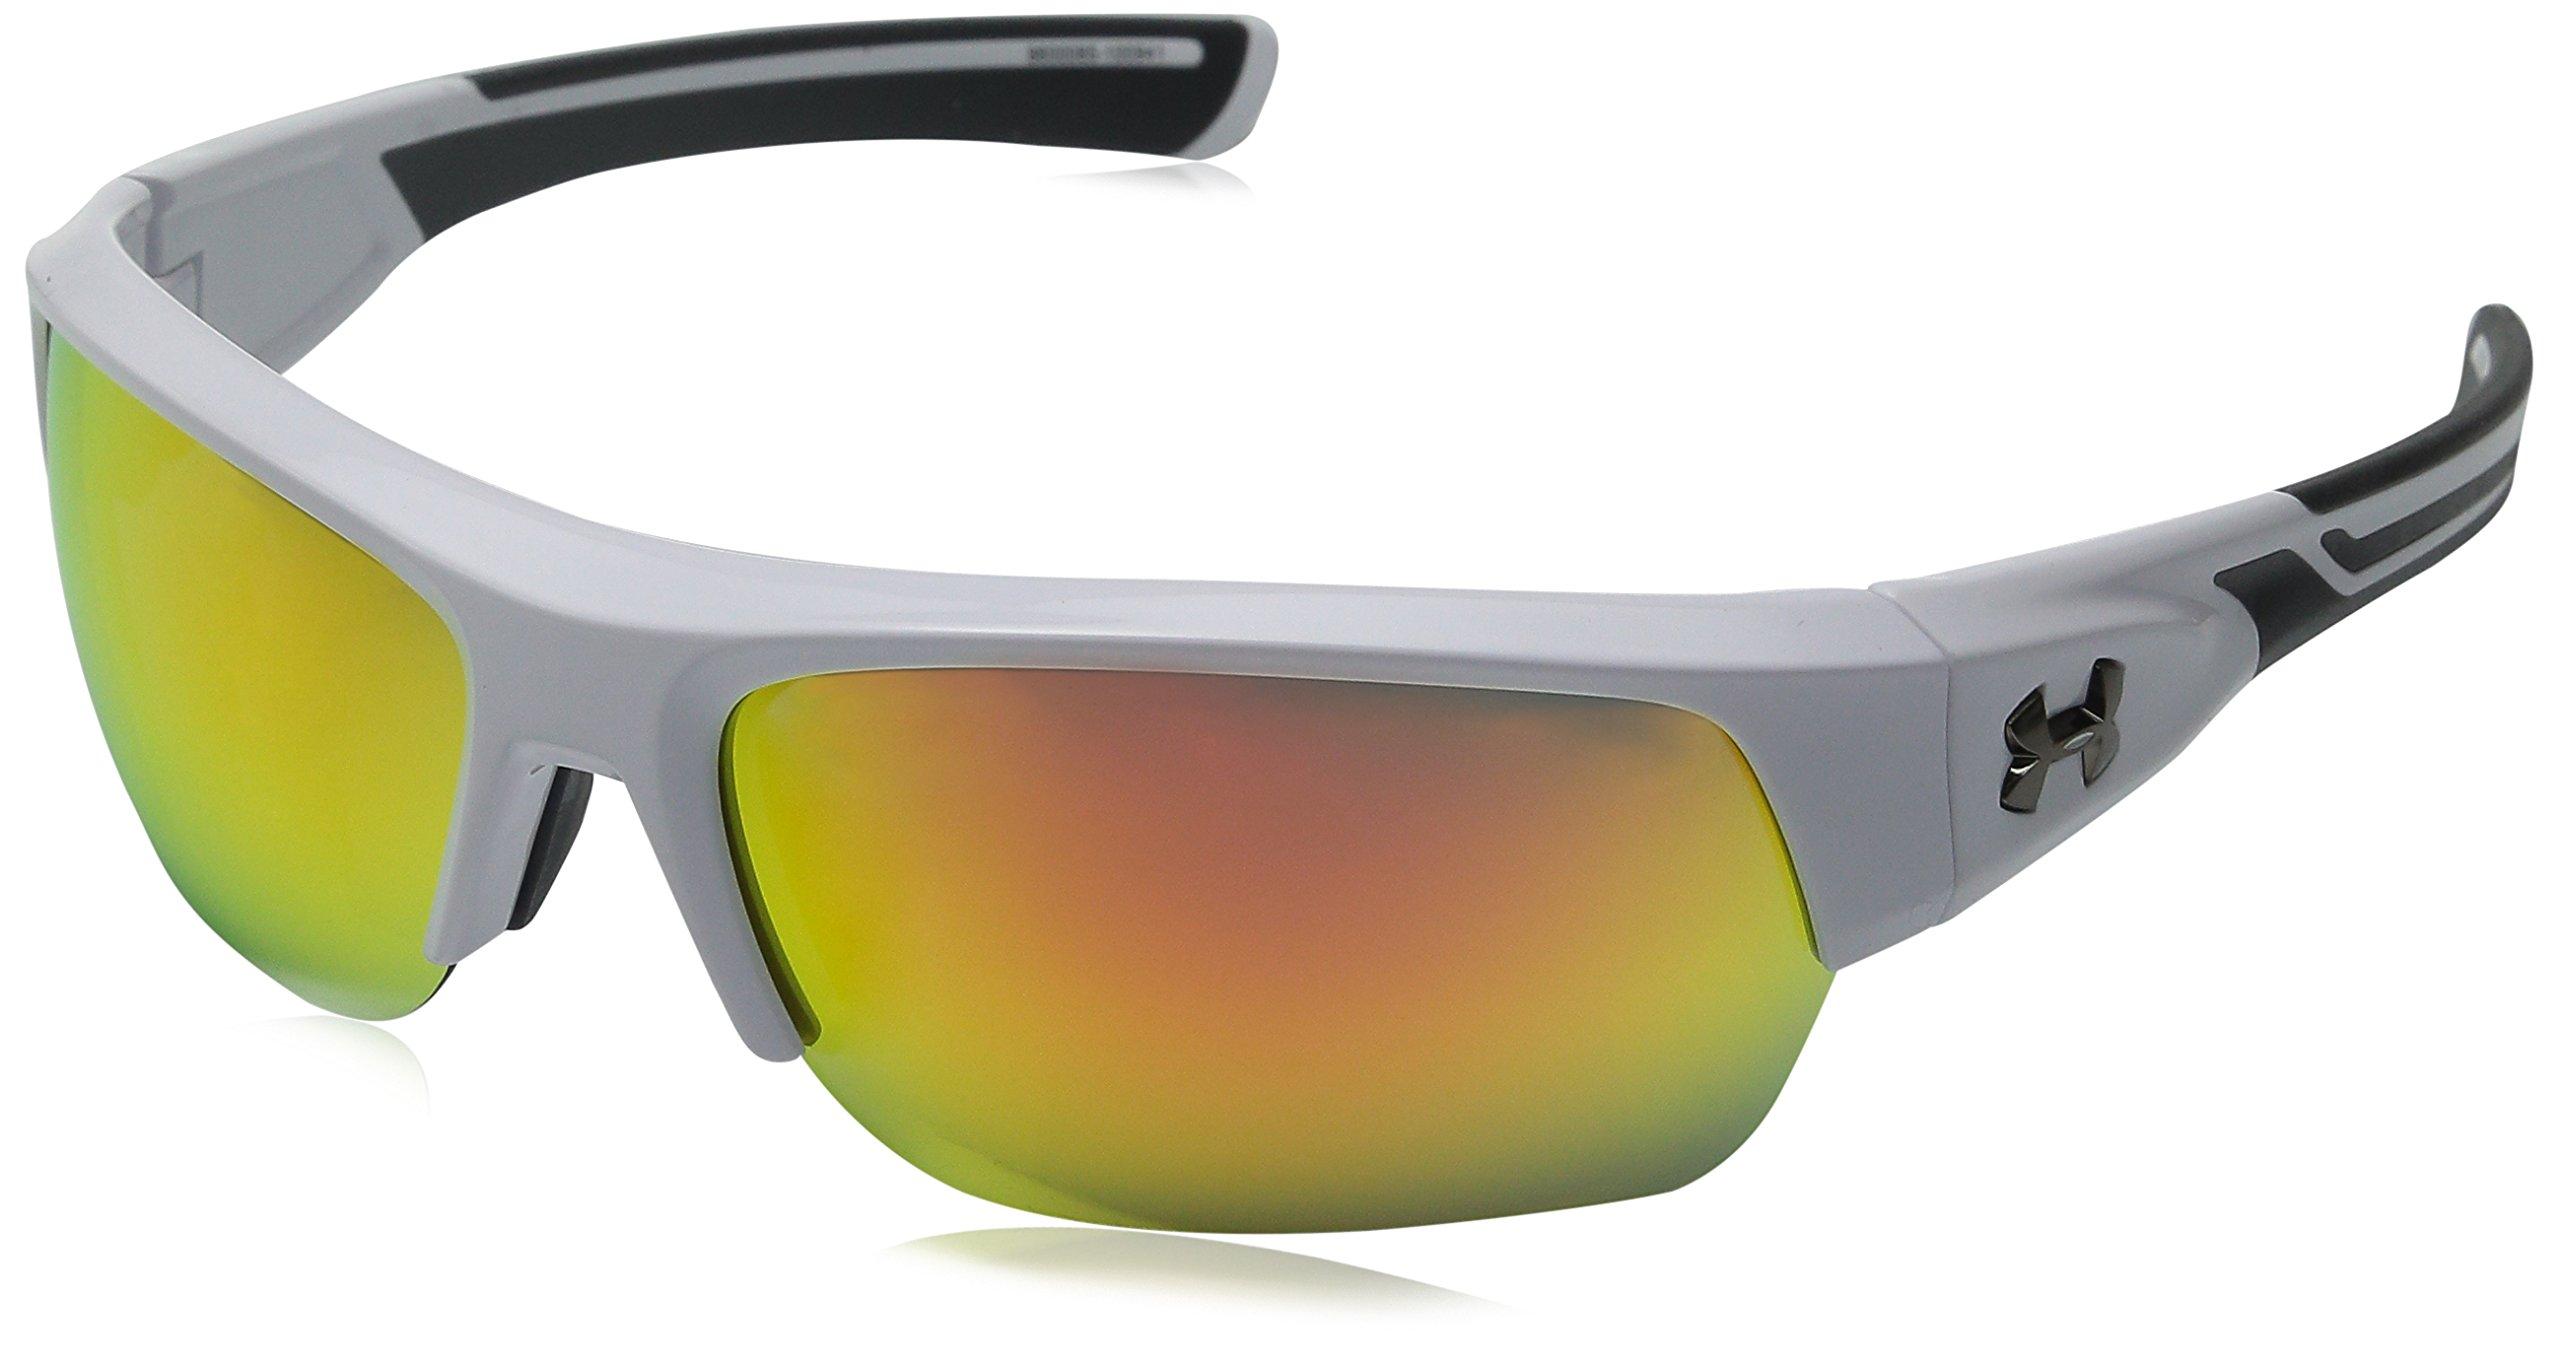 Under Armour Big Shot Multiflection Sunglasses Rectangular, Shiny White/Charcoal Gray, 37 mm